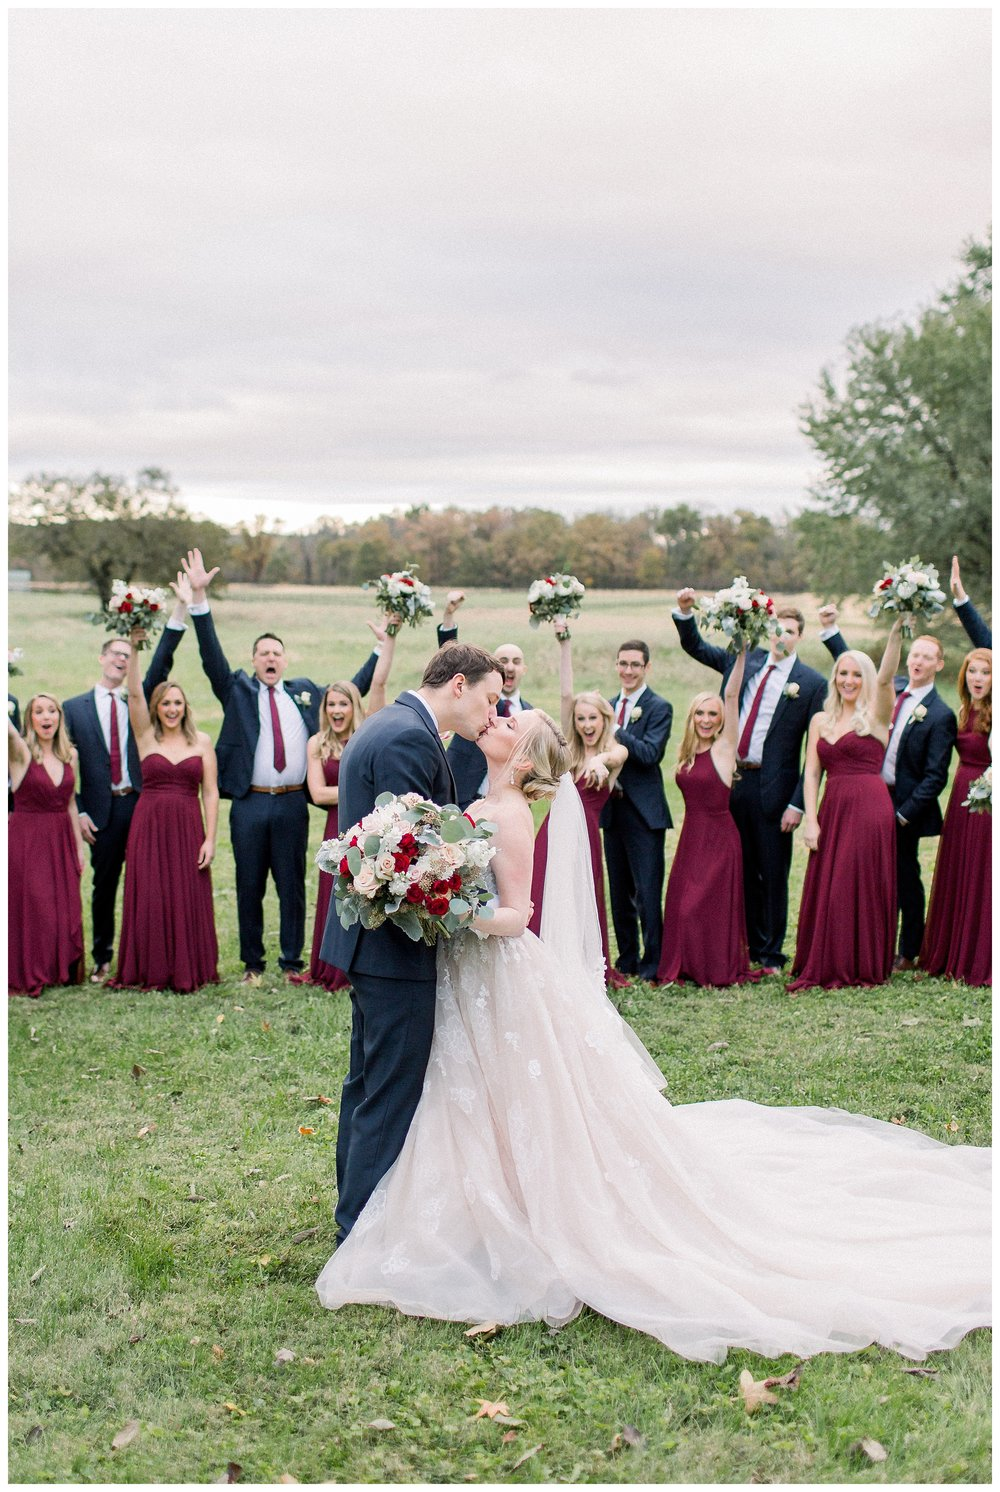 Whitehall Estate Wedding | Northern Virginia Wedding Photographer Kir Tuben_0079.jpg